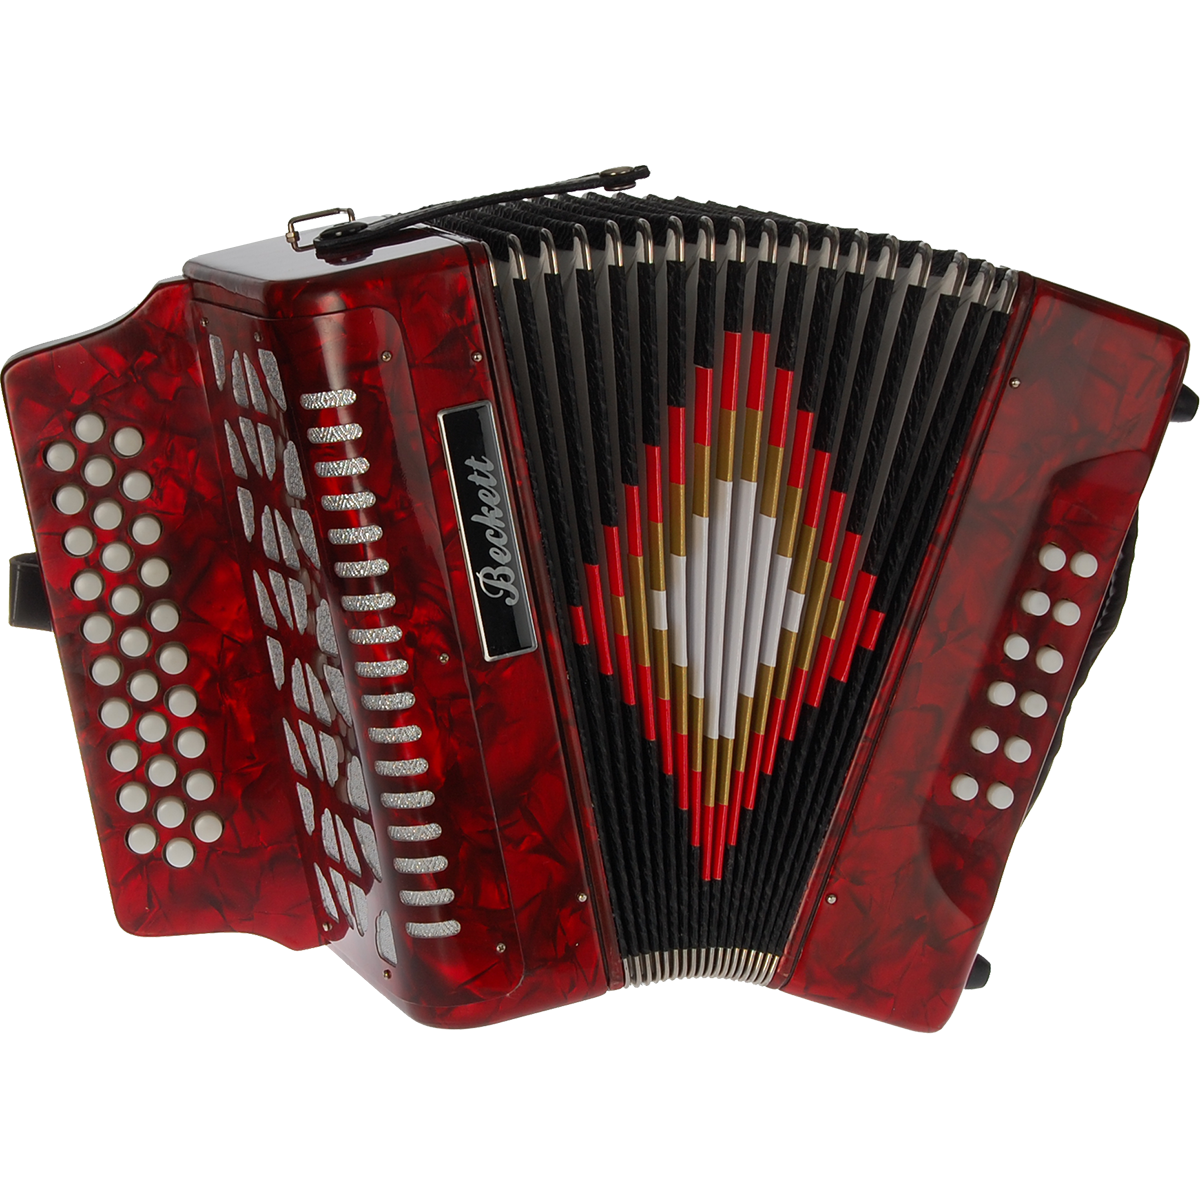 Billede af Beckett JH3112 knap-harmonika rød